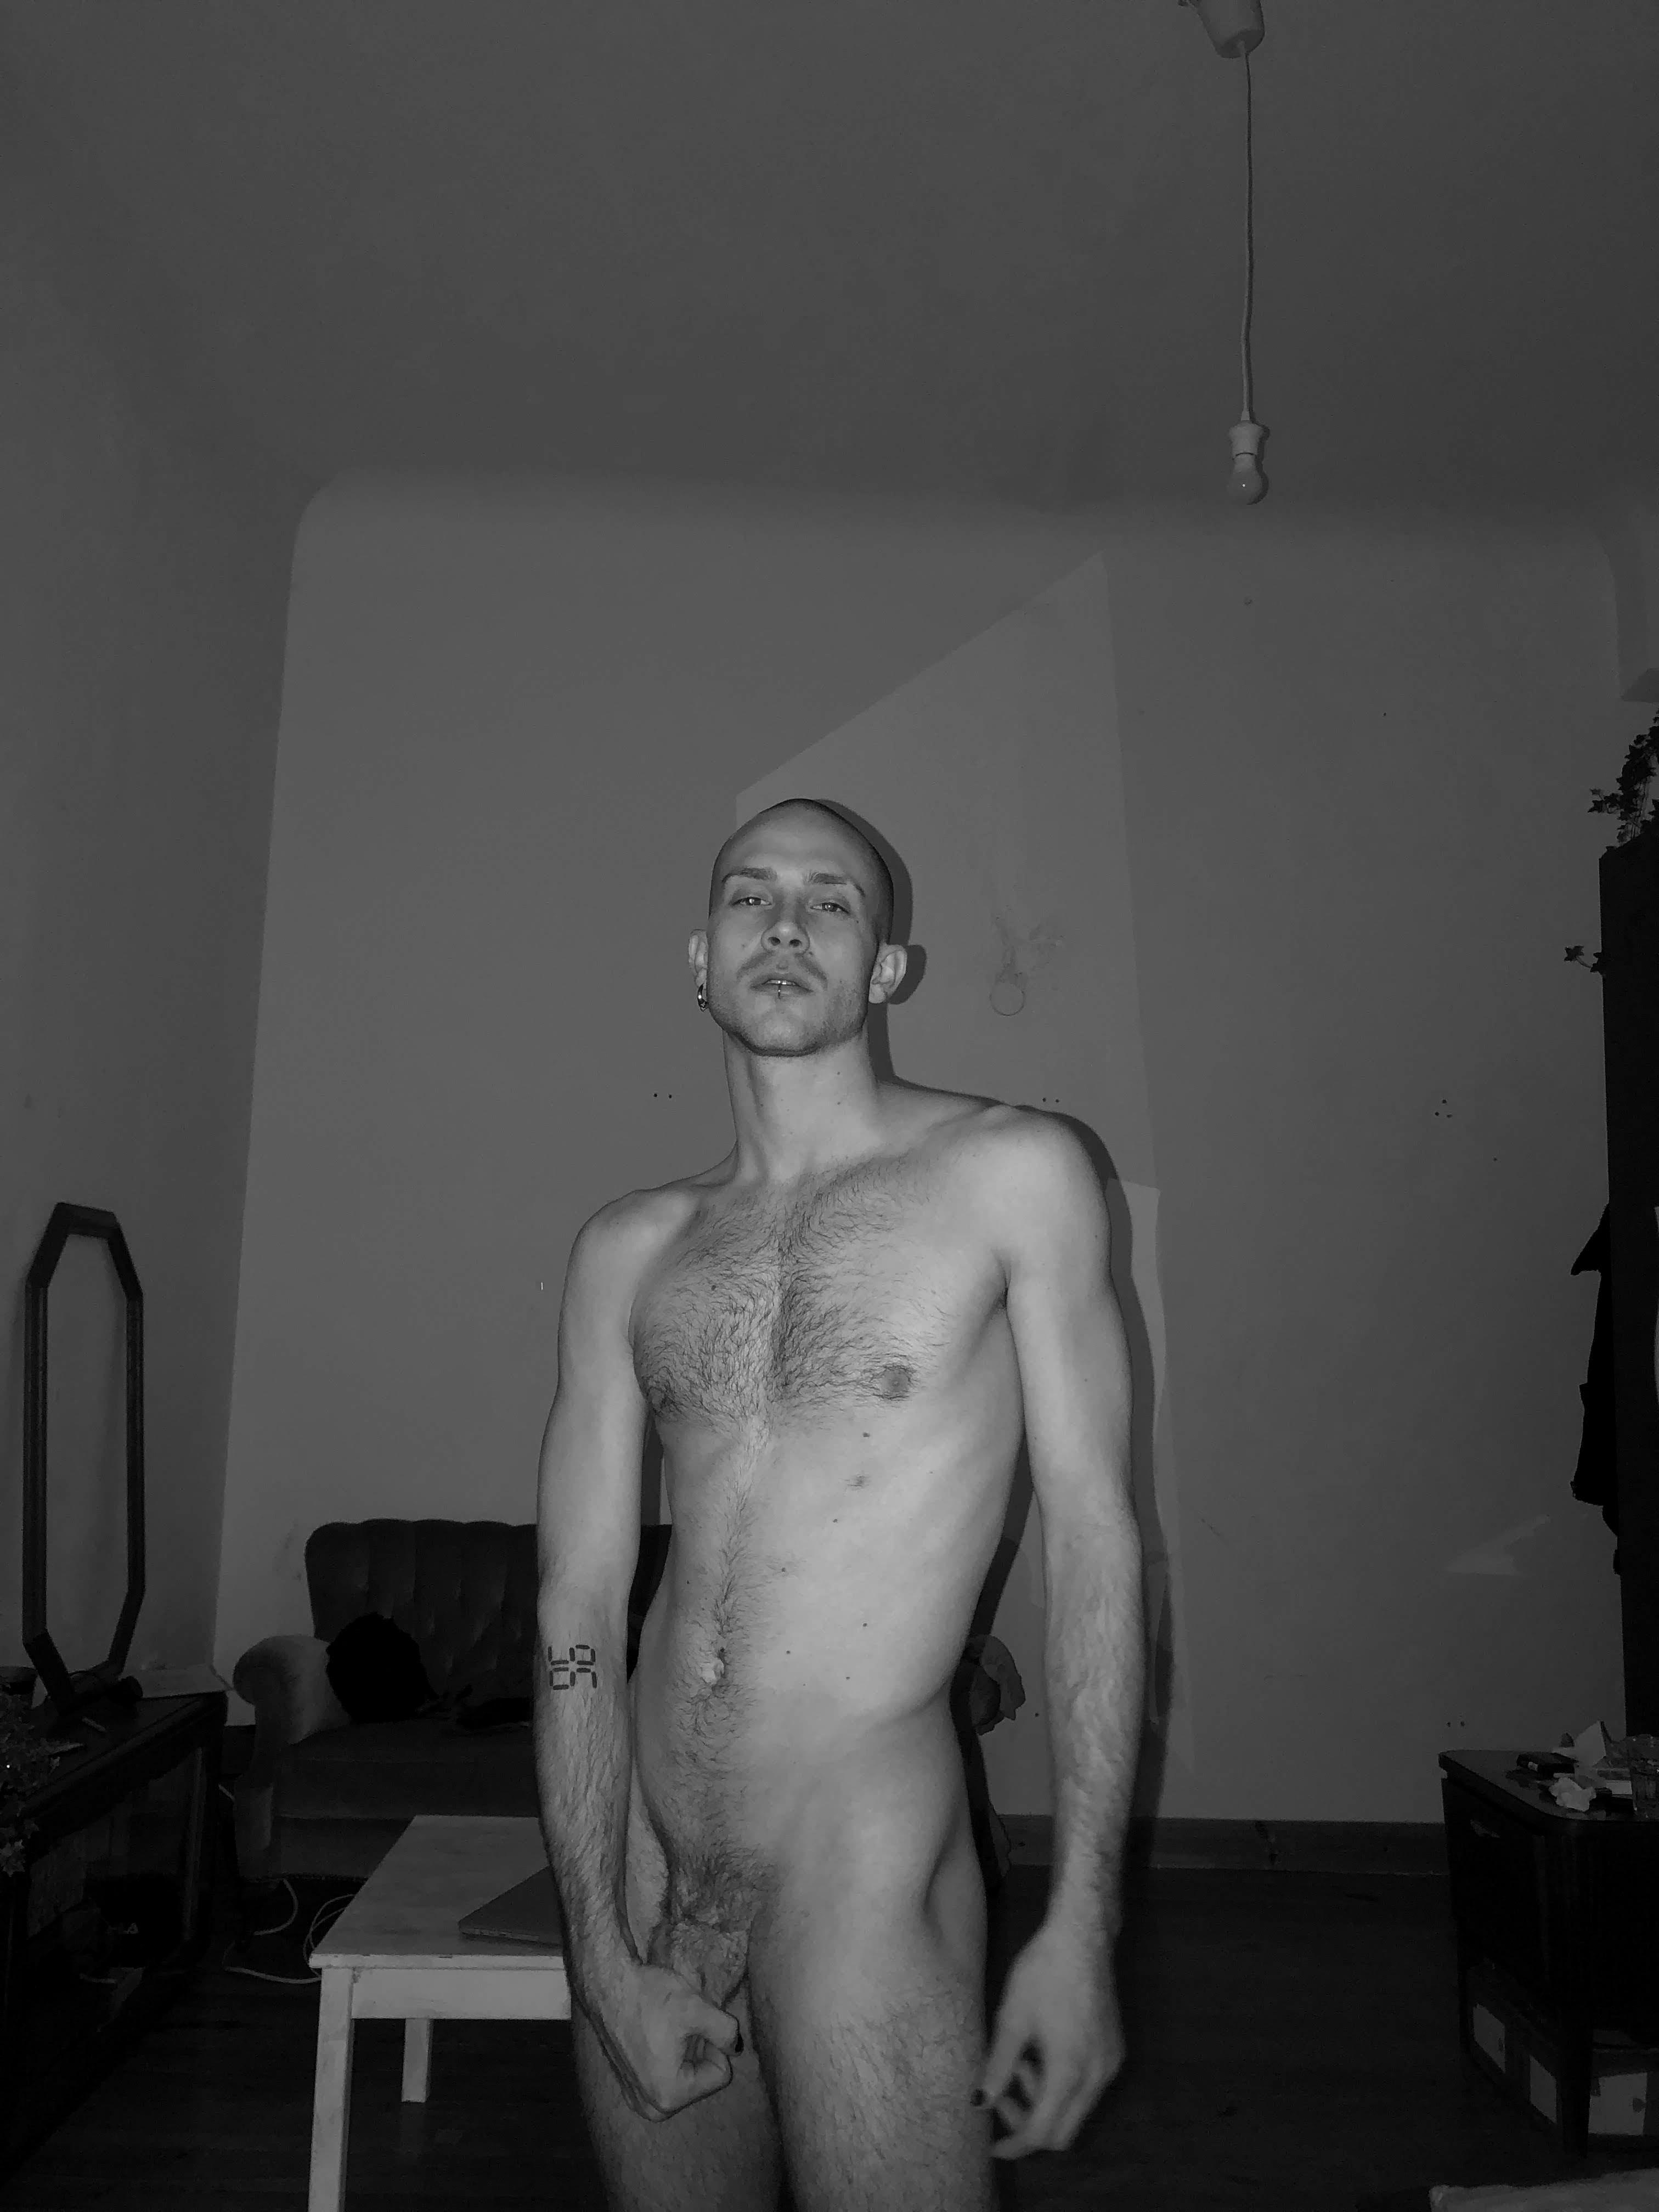 AlmosT NudE!, by Aljosha Forlini (NSFW) (NSFW).